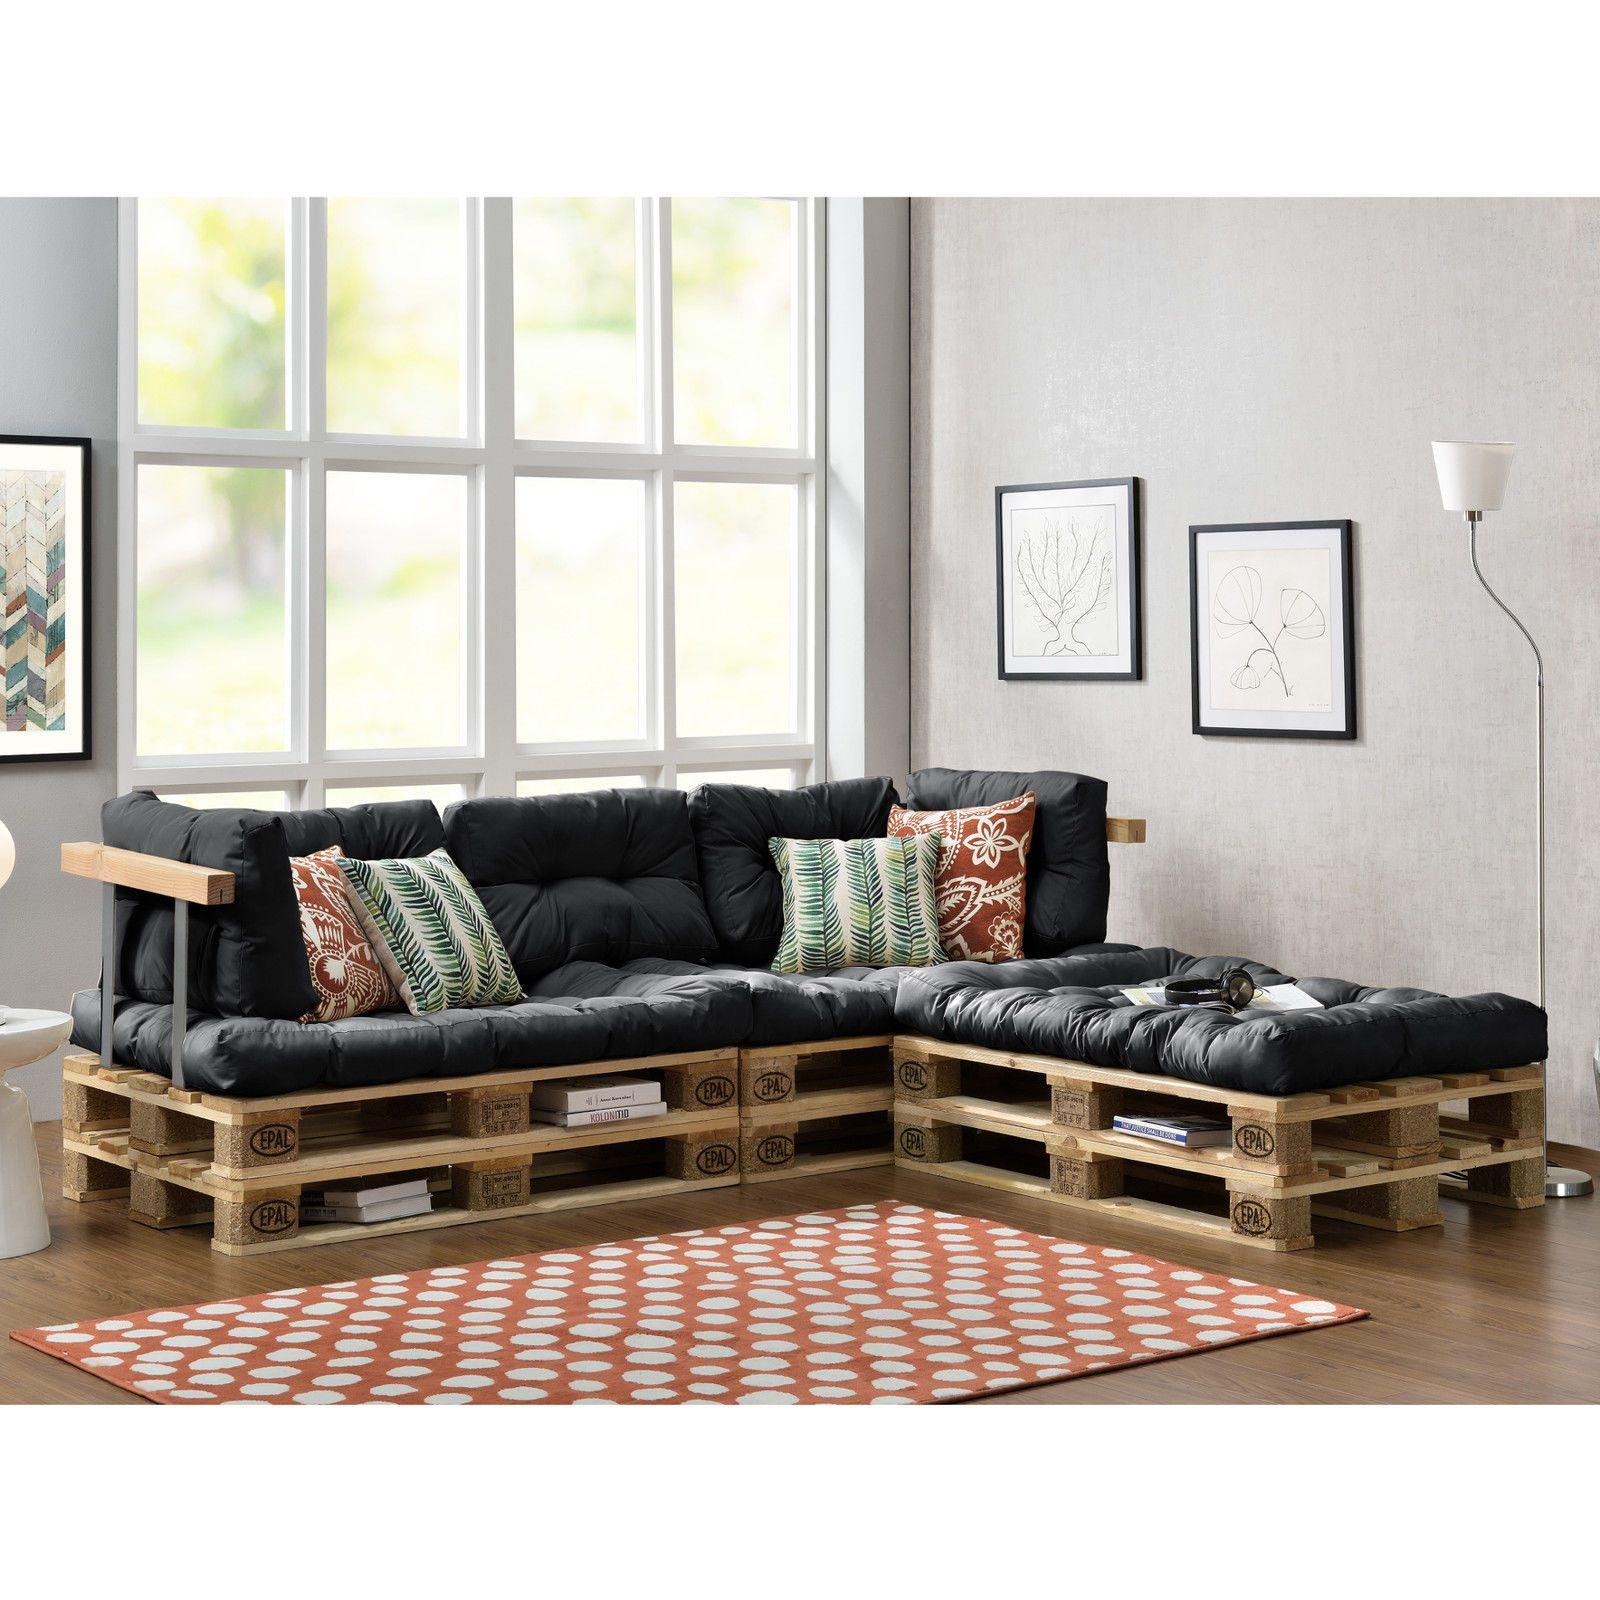 Sofa Paletten en casa paletten sofa 4x sitz 6x rückenkissen grau kissen